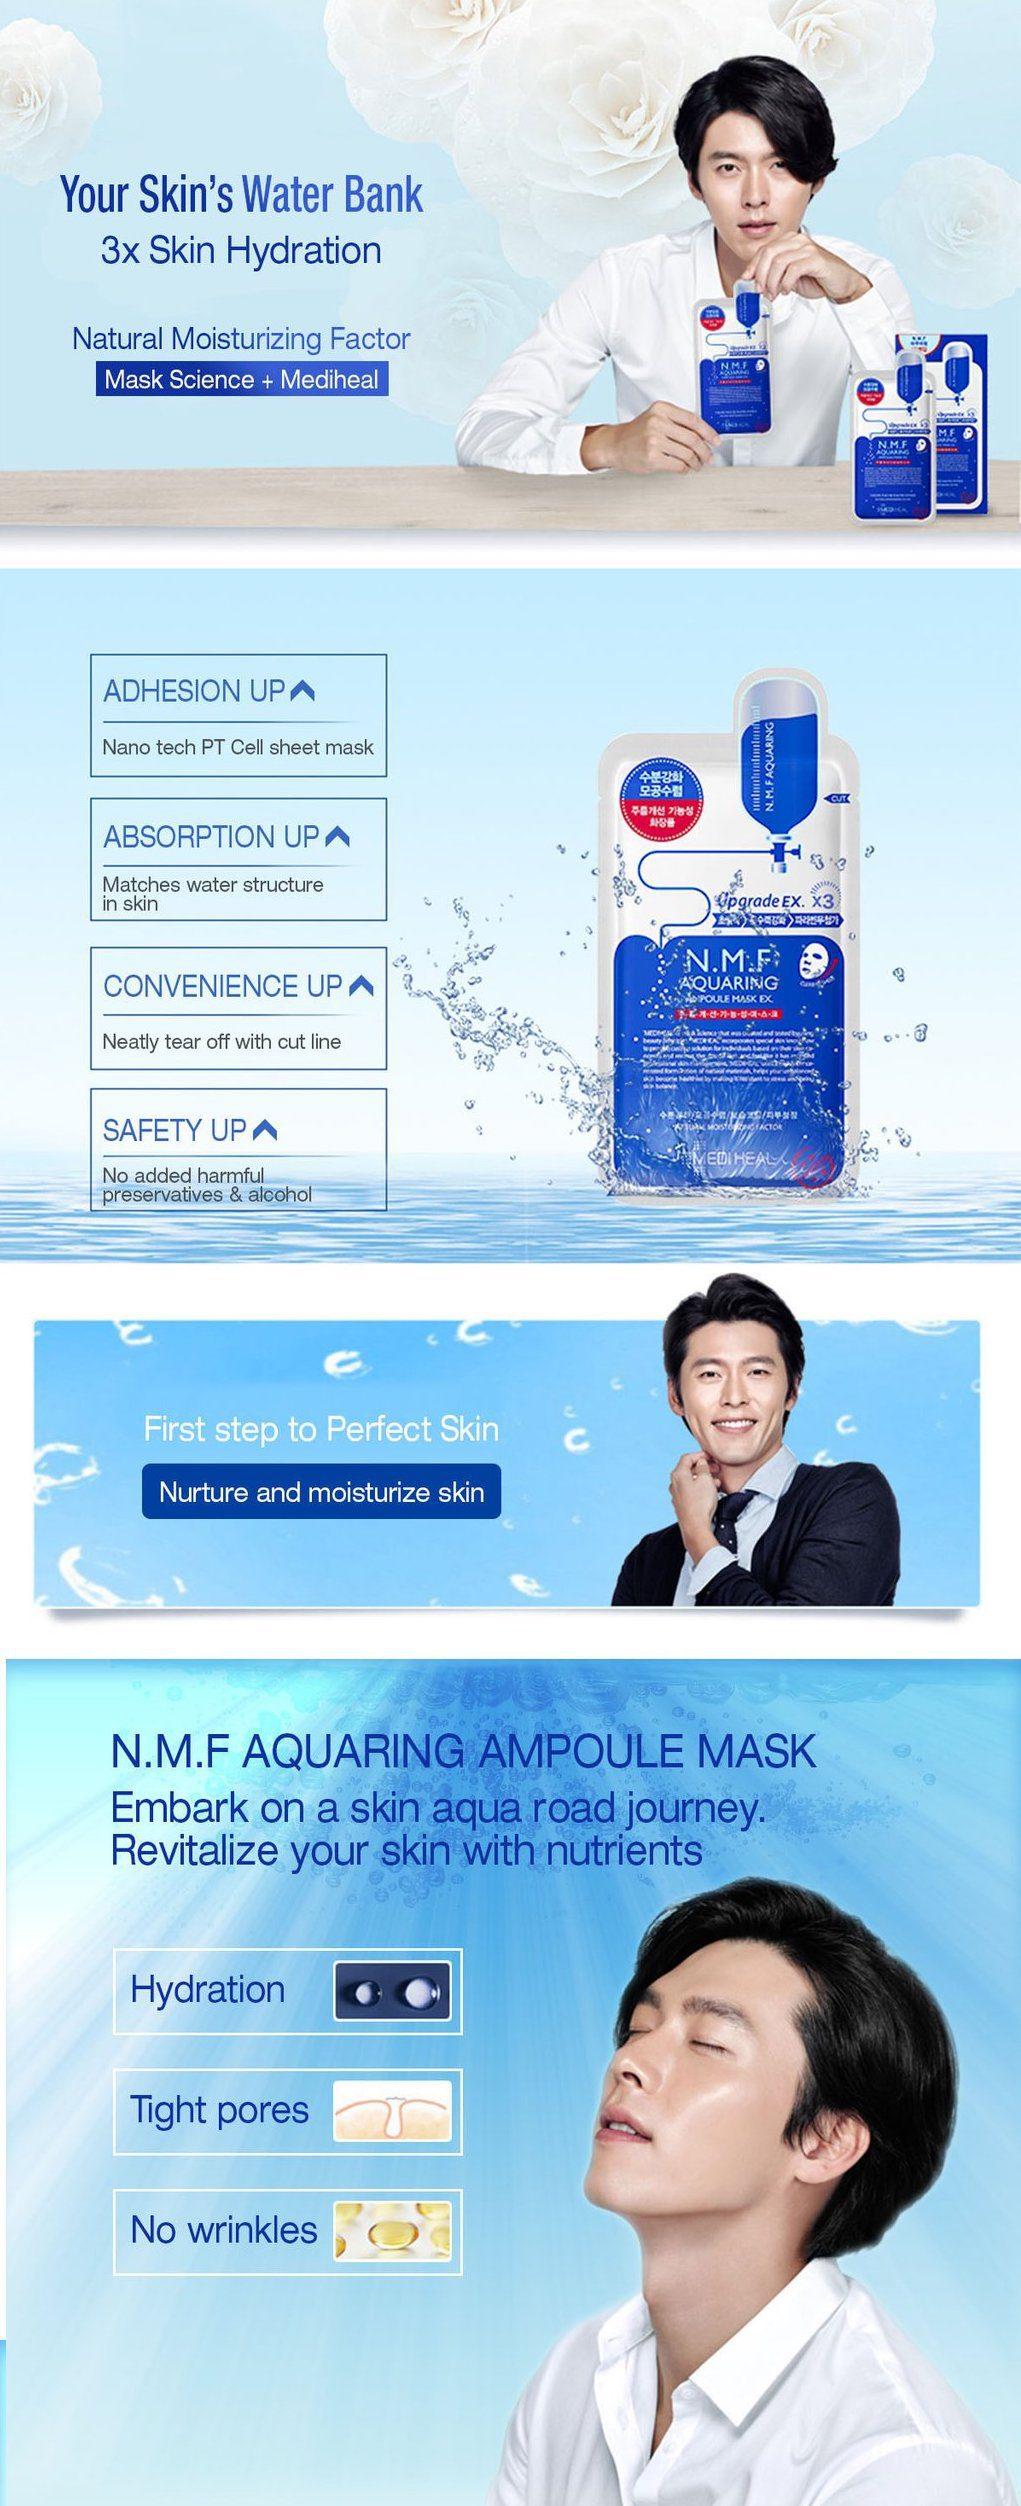 YS Infographic 27 Mediheal N.M.F Aquaring Ampoule Mask 01 02 1024x 1 - فروشگاه اینترنتی می شاپ